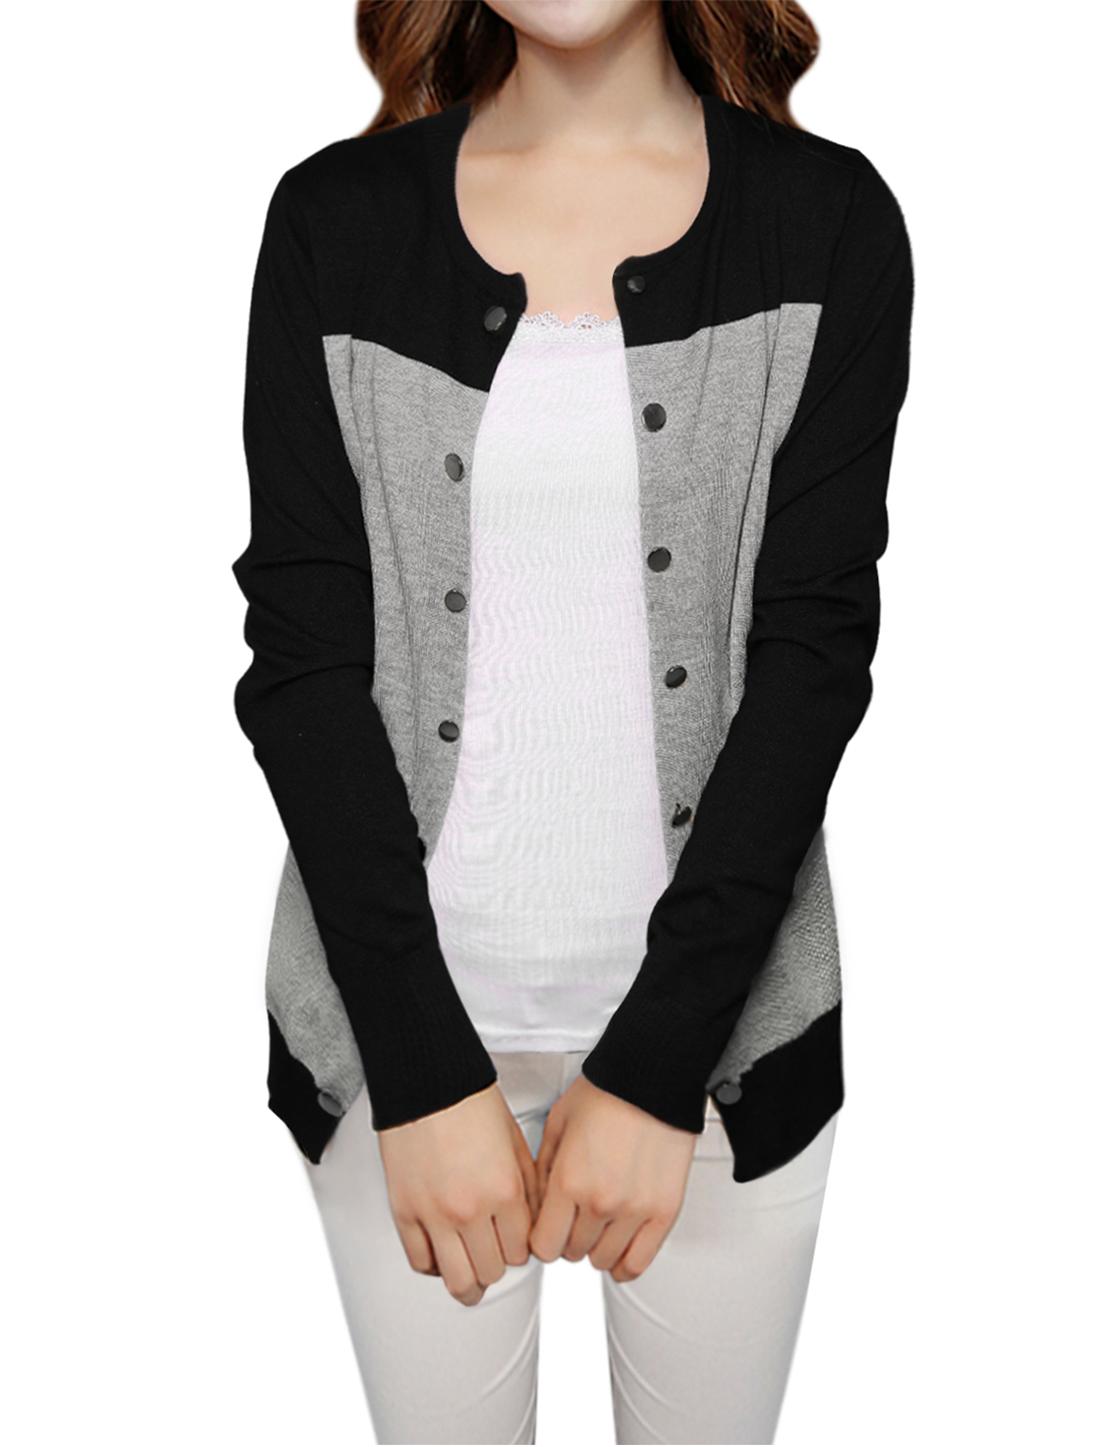 Women Color Block Long Sleeves Slim Fit Knit Cardigan Black Light Gray M